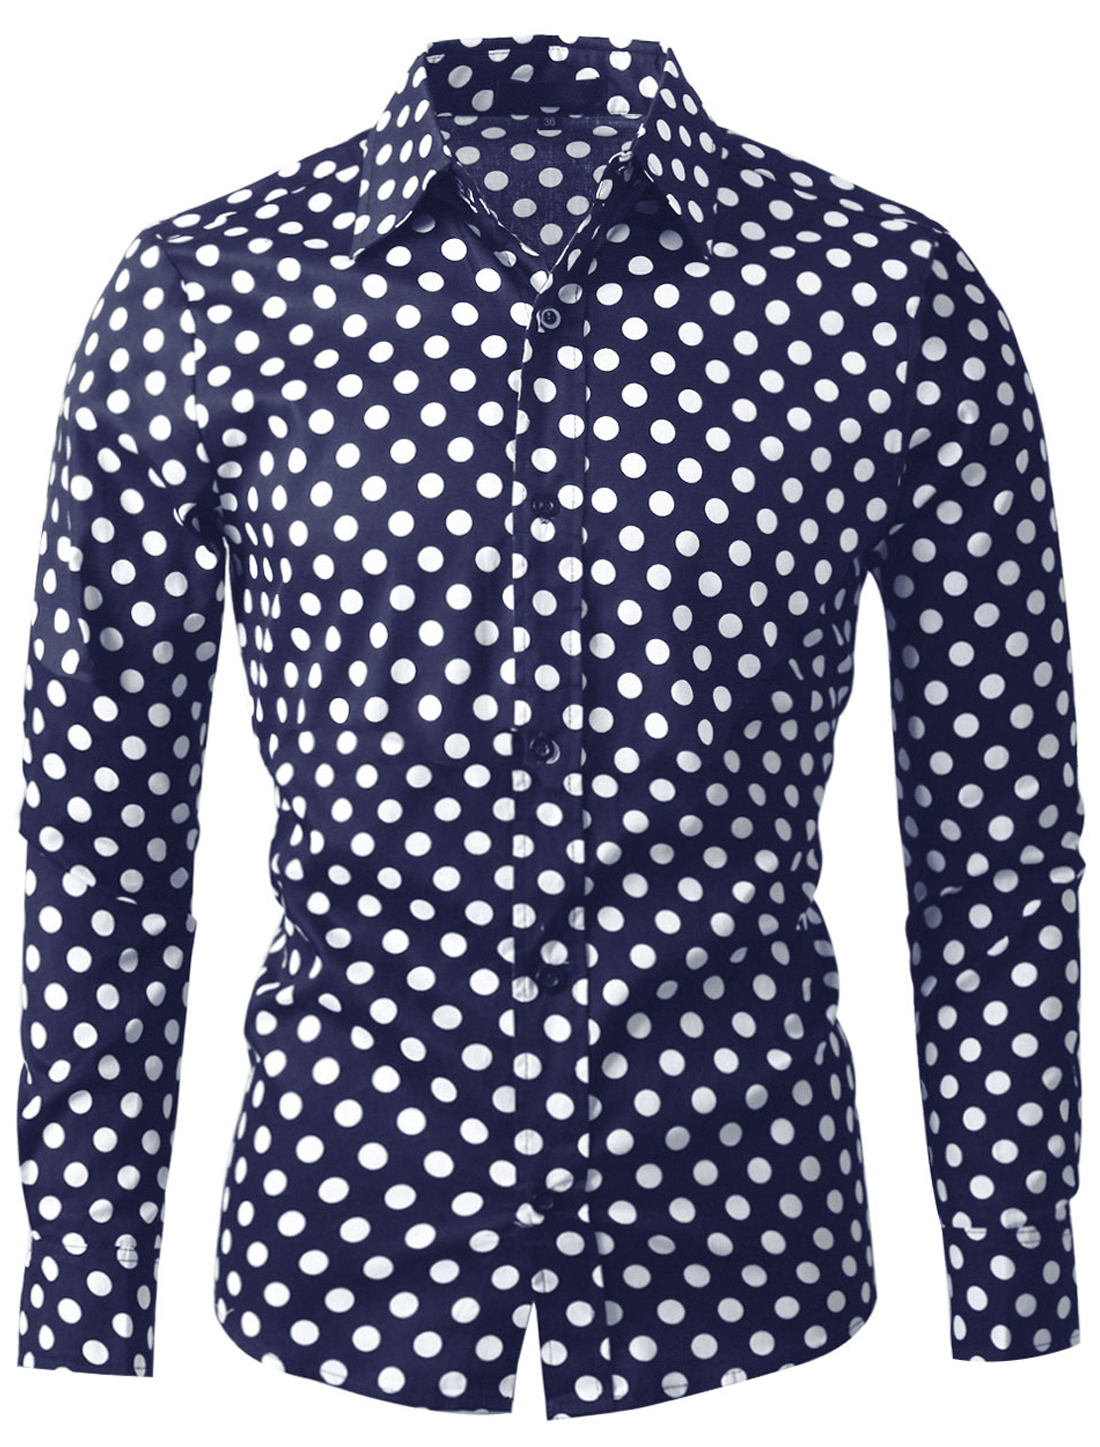 Men 100% Cotton Polka Dots Long Sleeve Slim Fit Dress Shirt Navy Blue 36